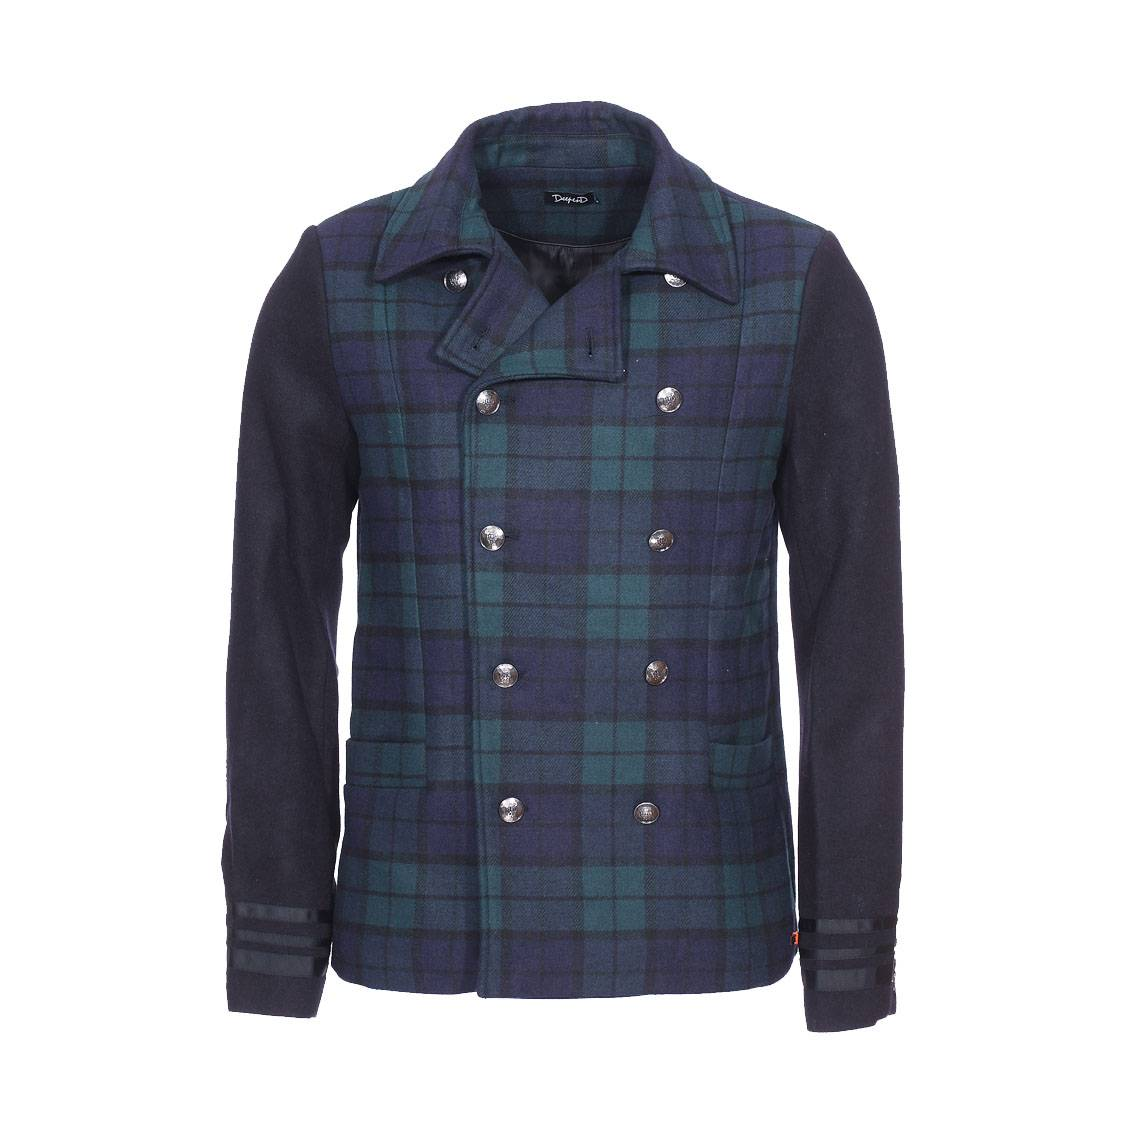 Deepend - manteau, caban, duffle coat